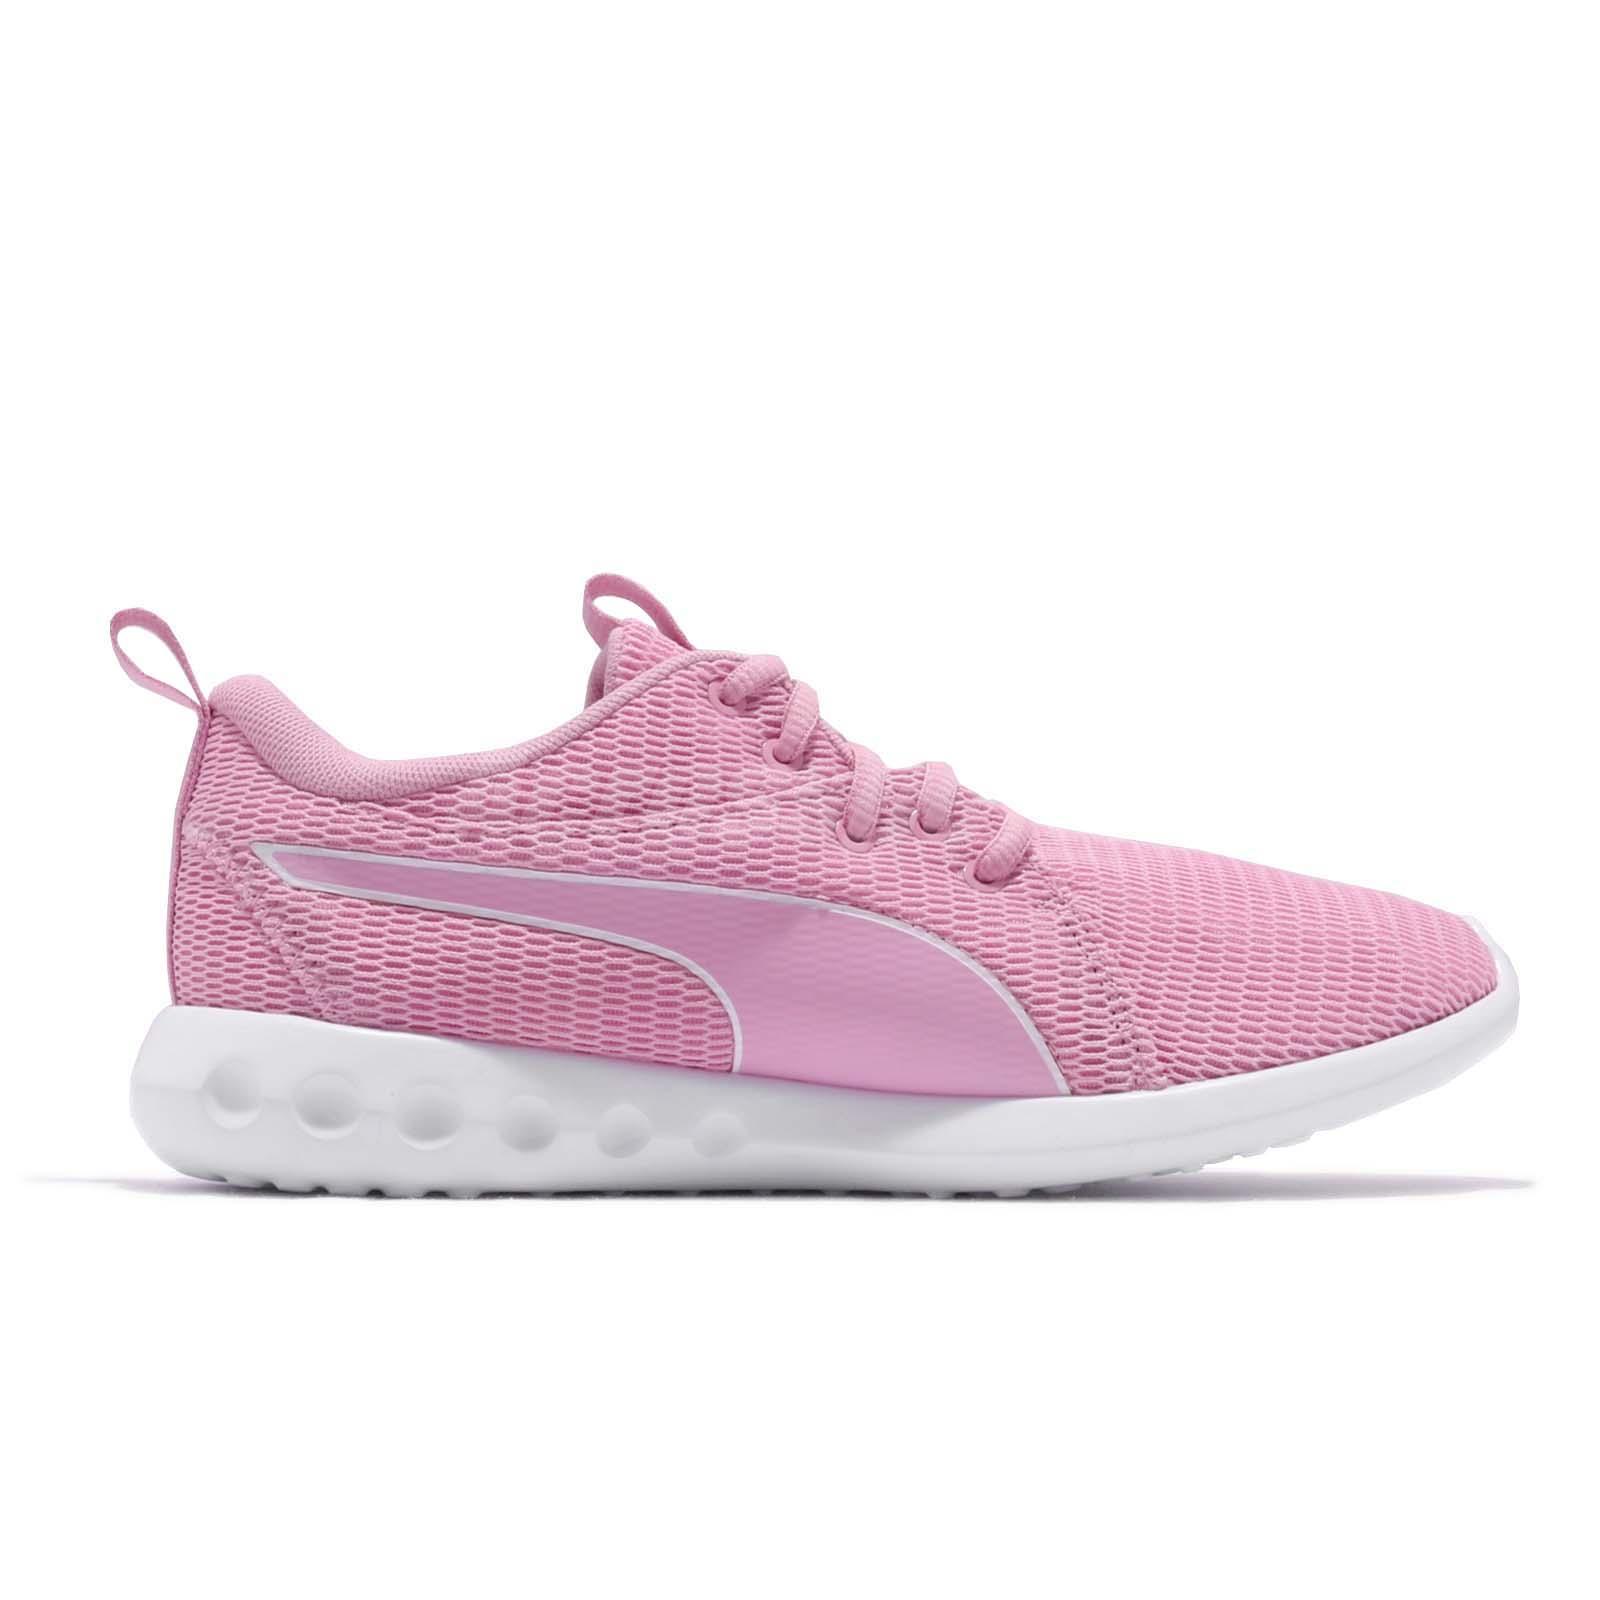 b9c4cf450da Puma Carson 2 New Core Wns Pale Pink White Women Running Casual ...